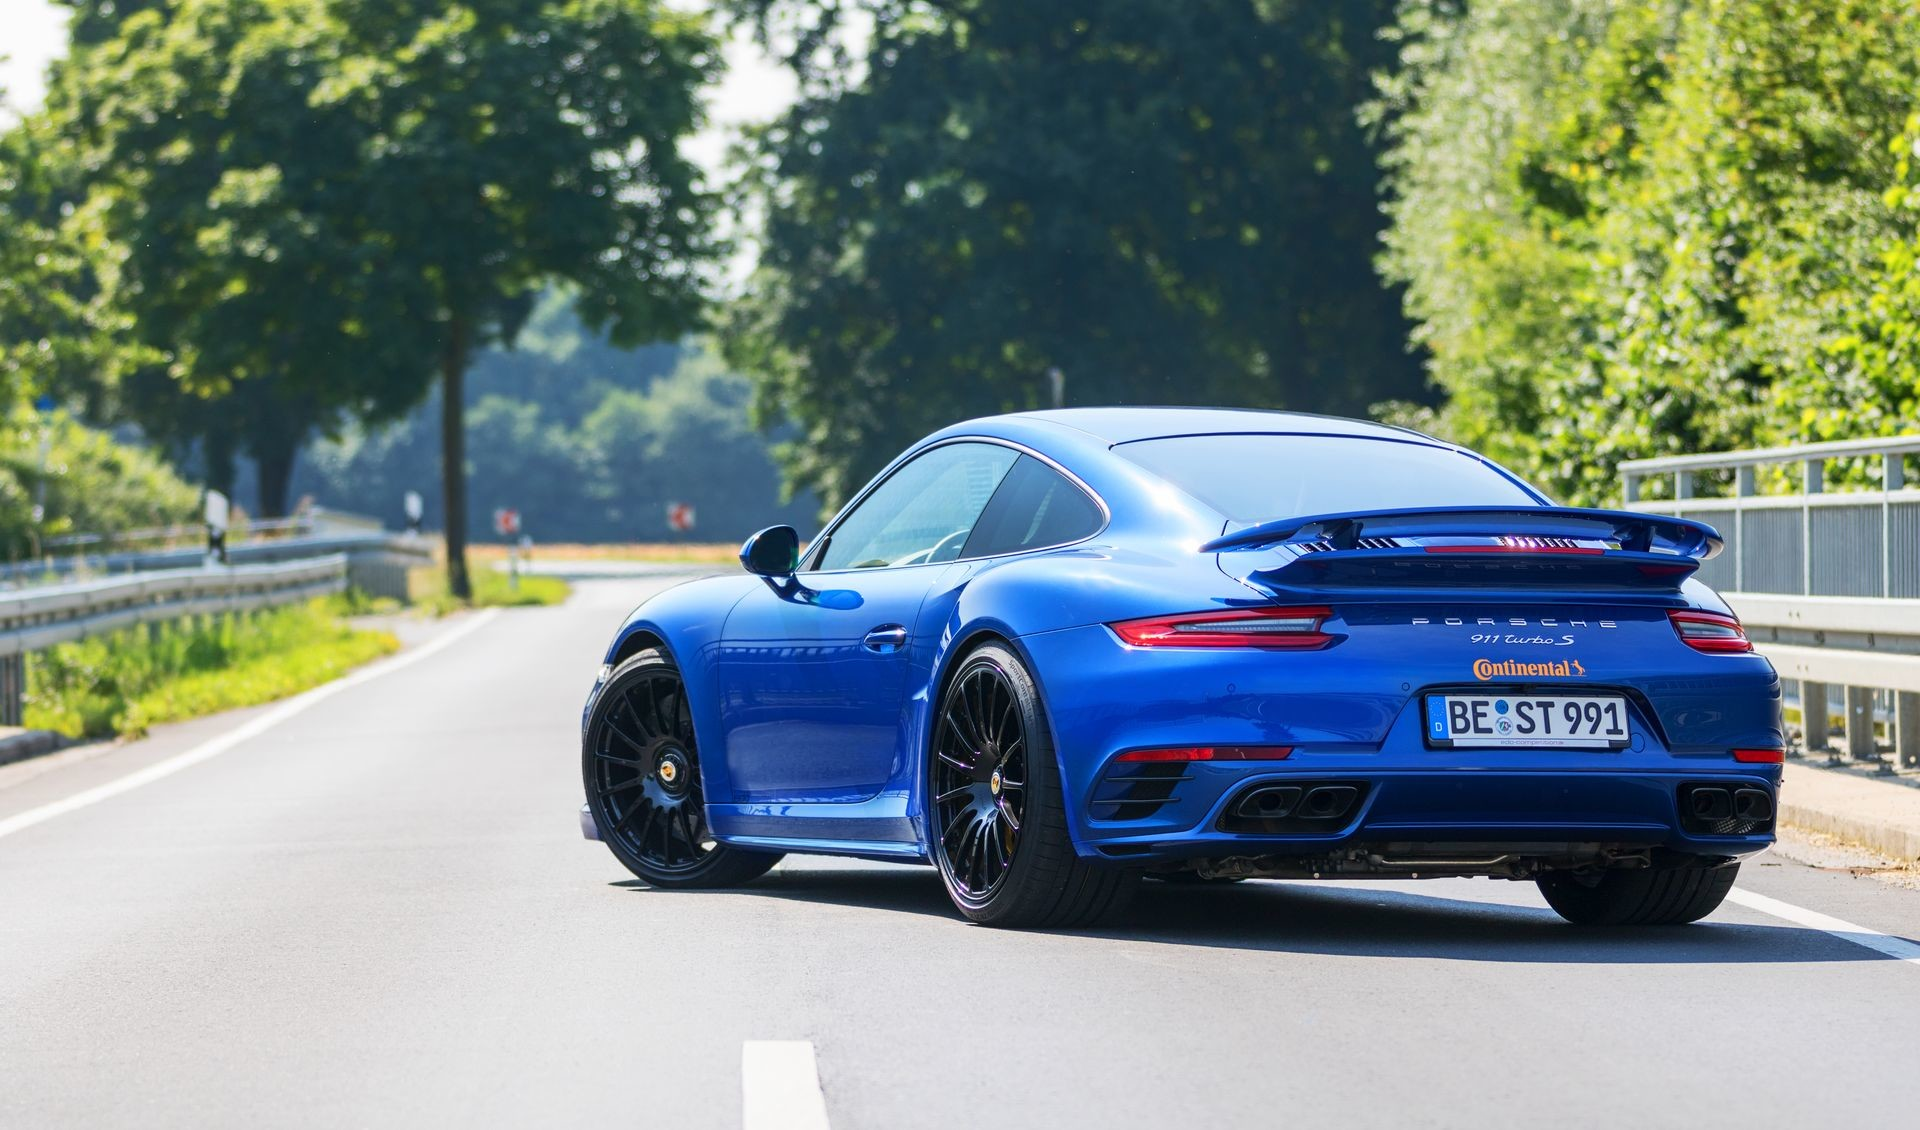 Foto de Porsche 911 Turbo S Blue Arrow (25/25)